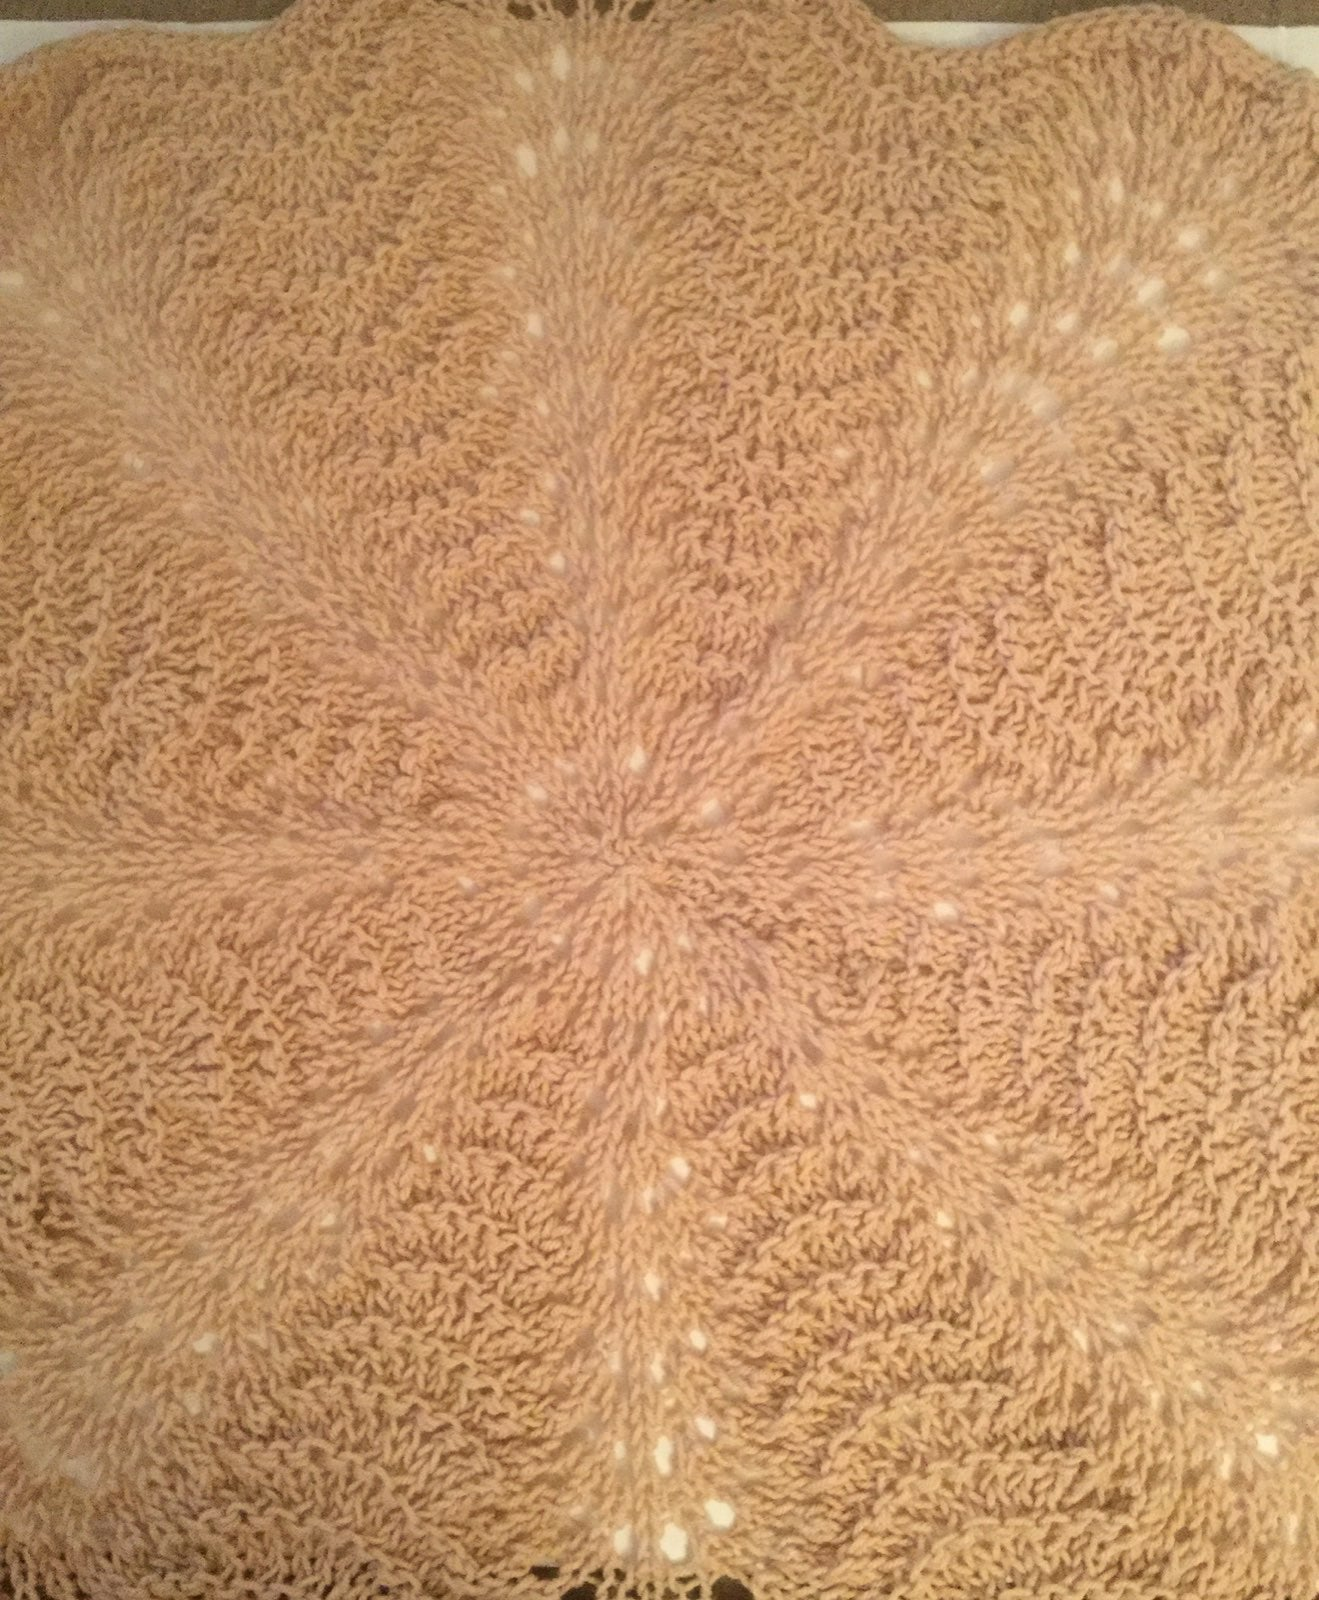 Circular knit swirl blanket